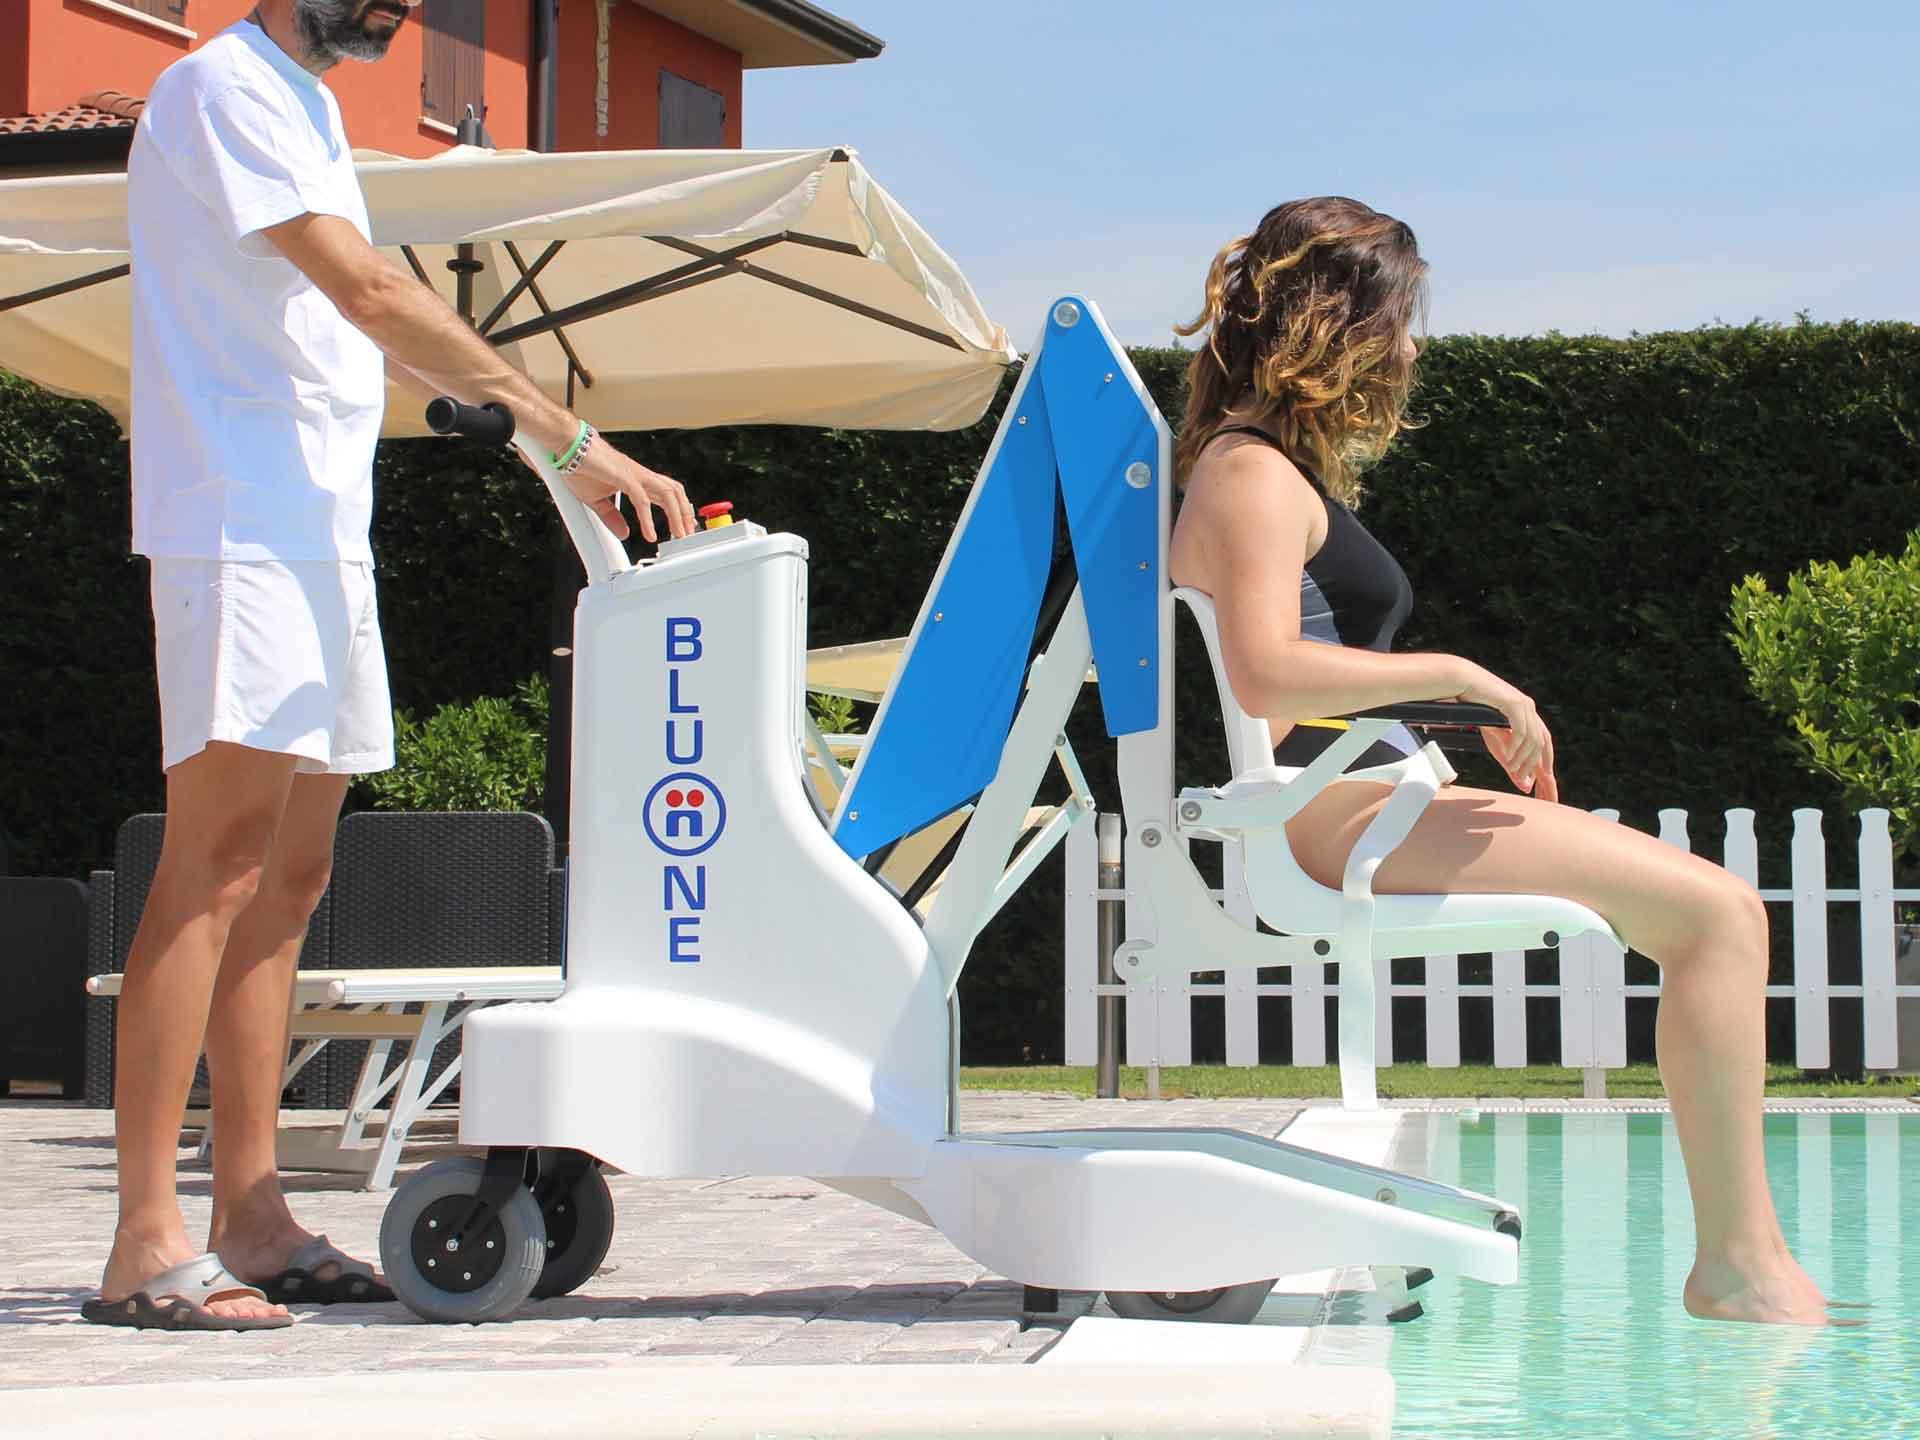 Louer elevateur mobile piscine bluone pmr handicapes for Piscine mobile louer